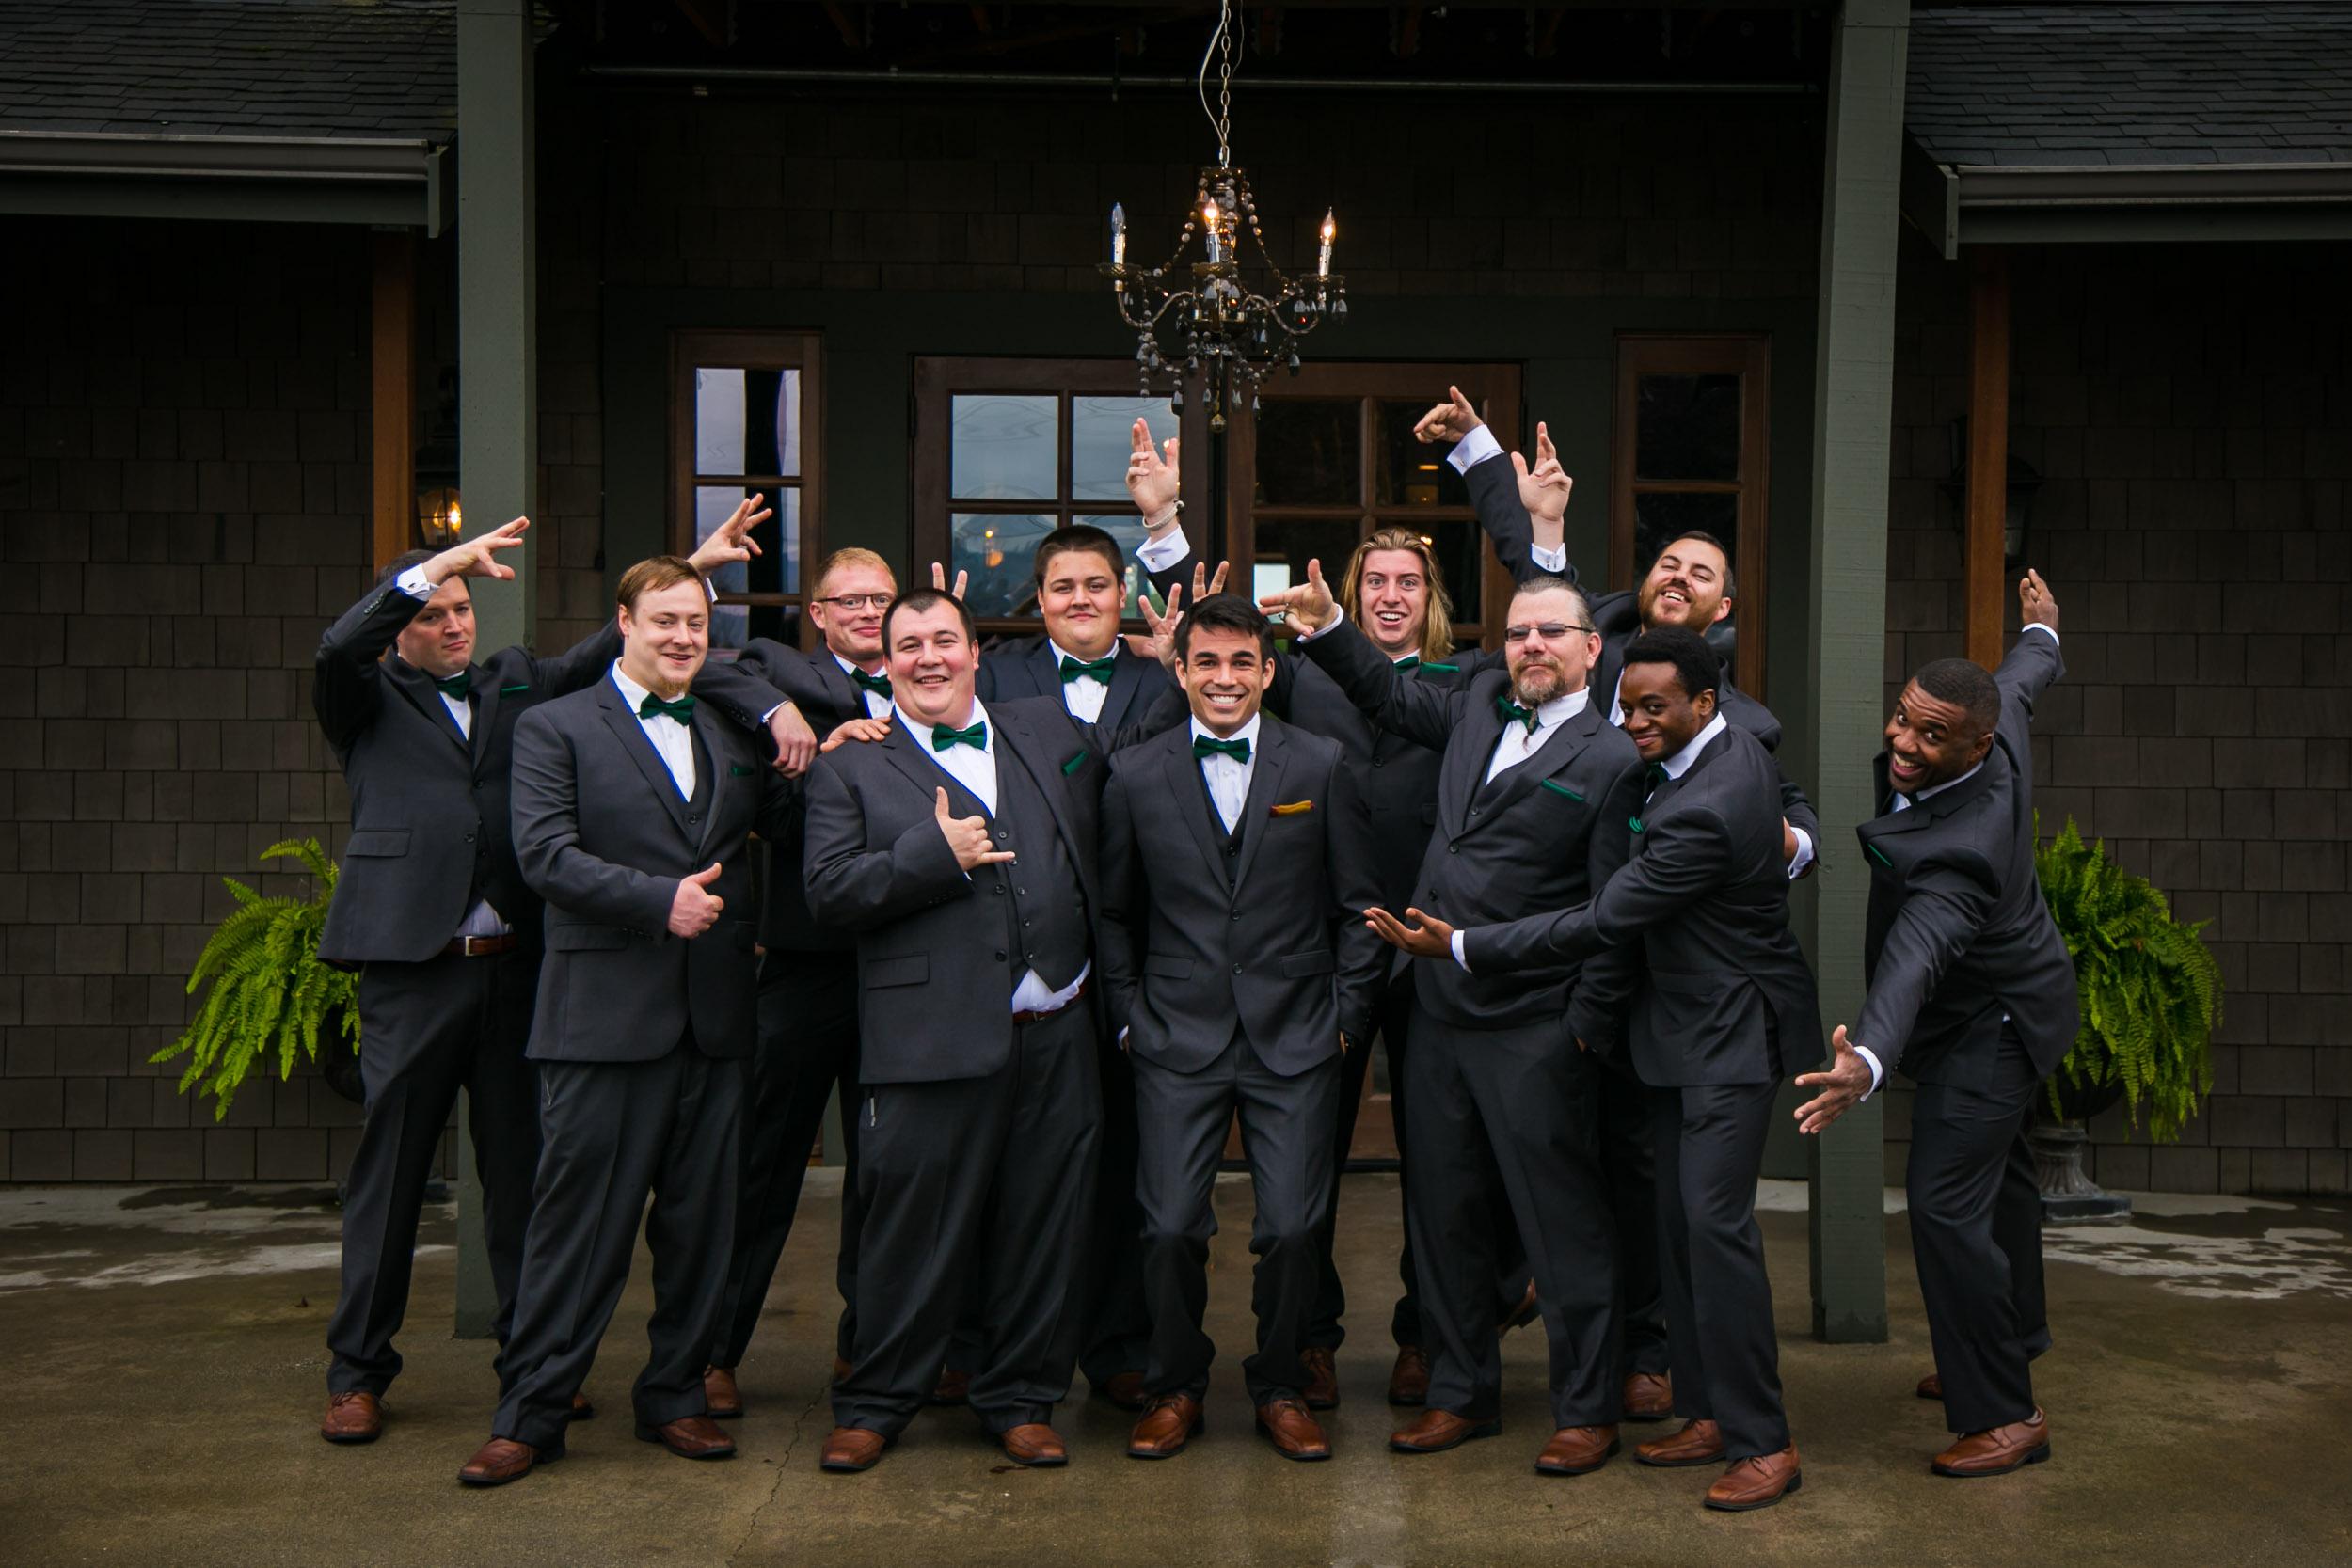 Groomsmen portrait, fall wedding | Durham Wedding Photographer | By G. Lin Photography